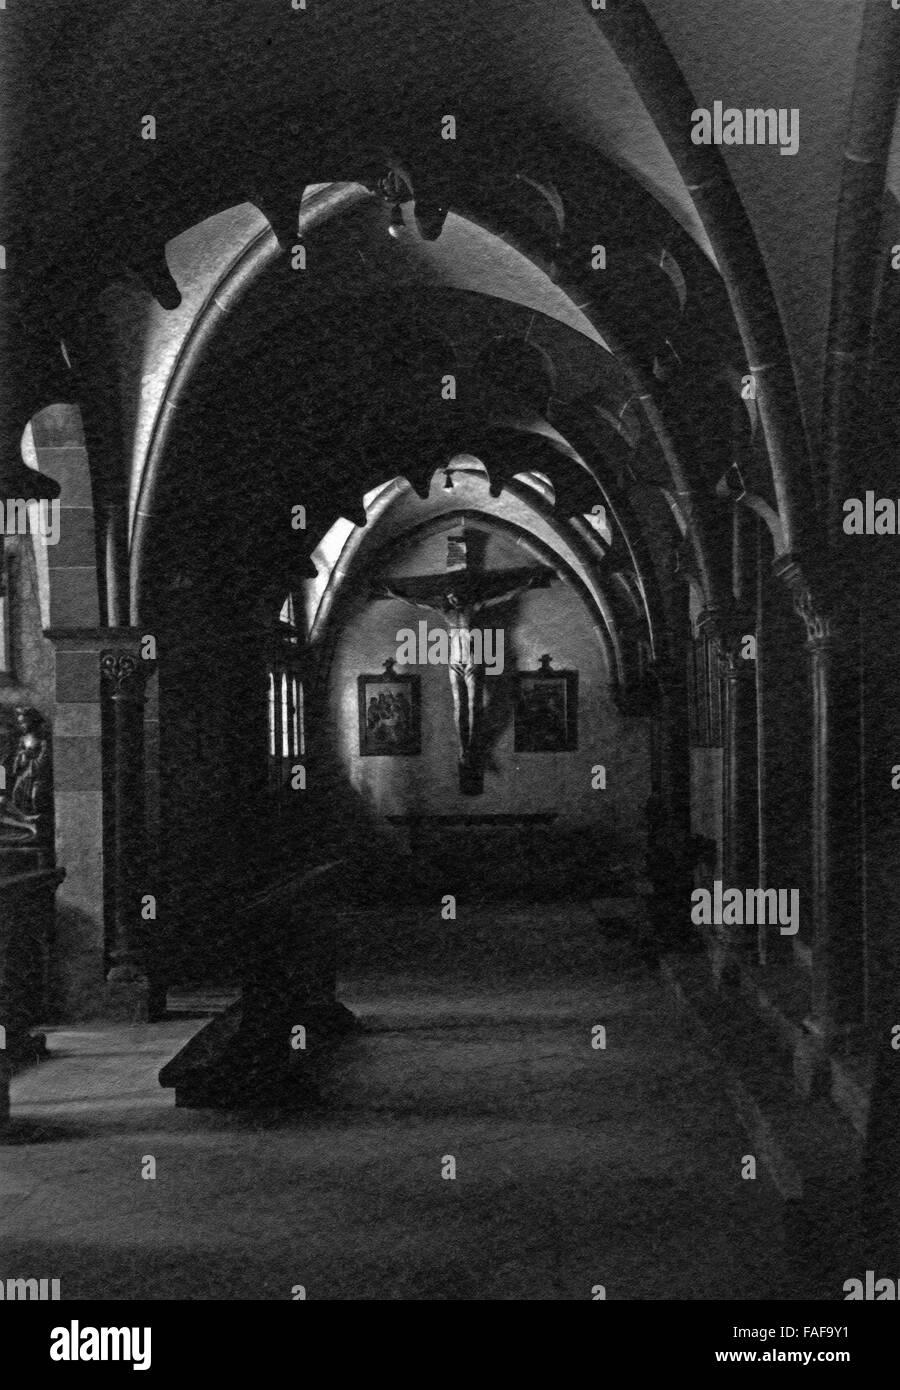 Im Inneren der Kirche St. Andreas dans Köln, Deutschland 1920er ...